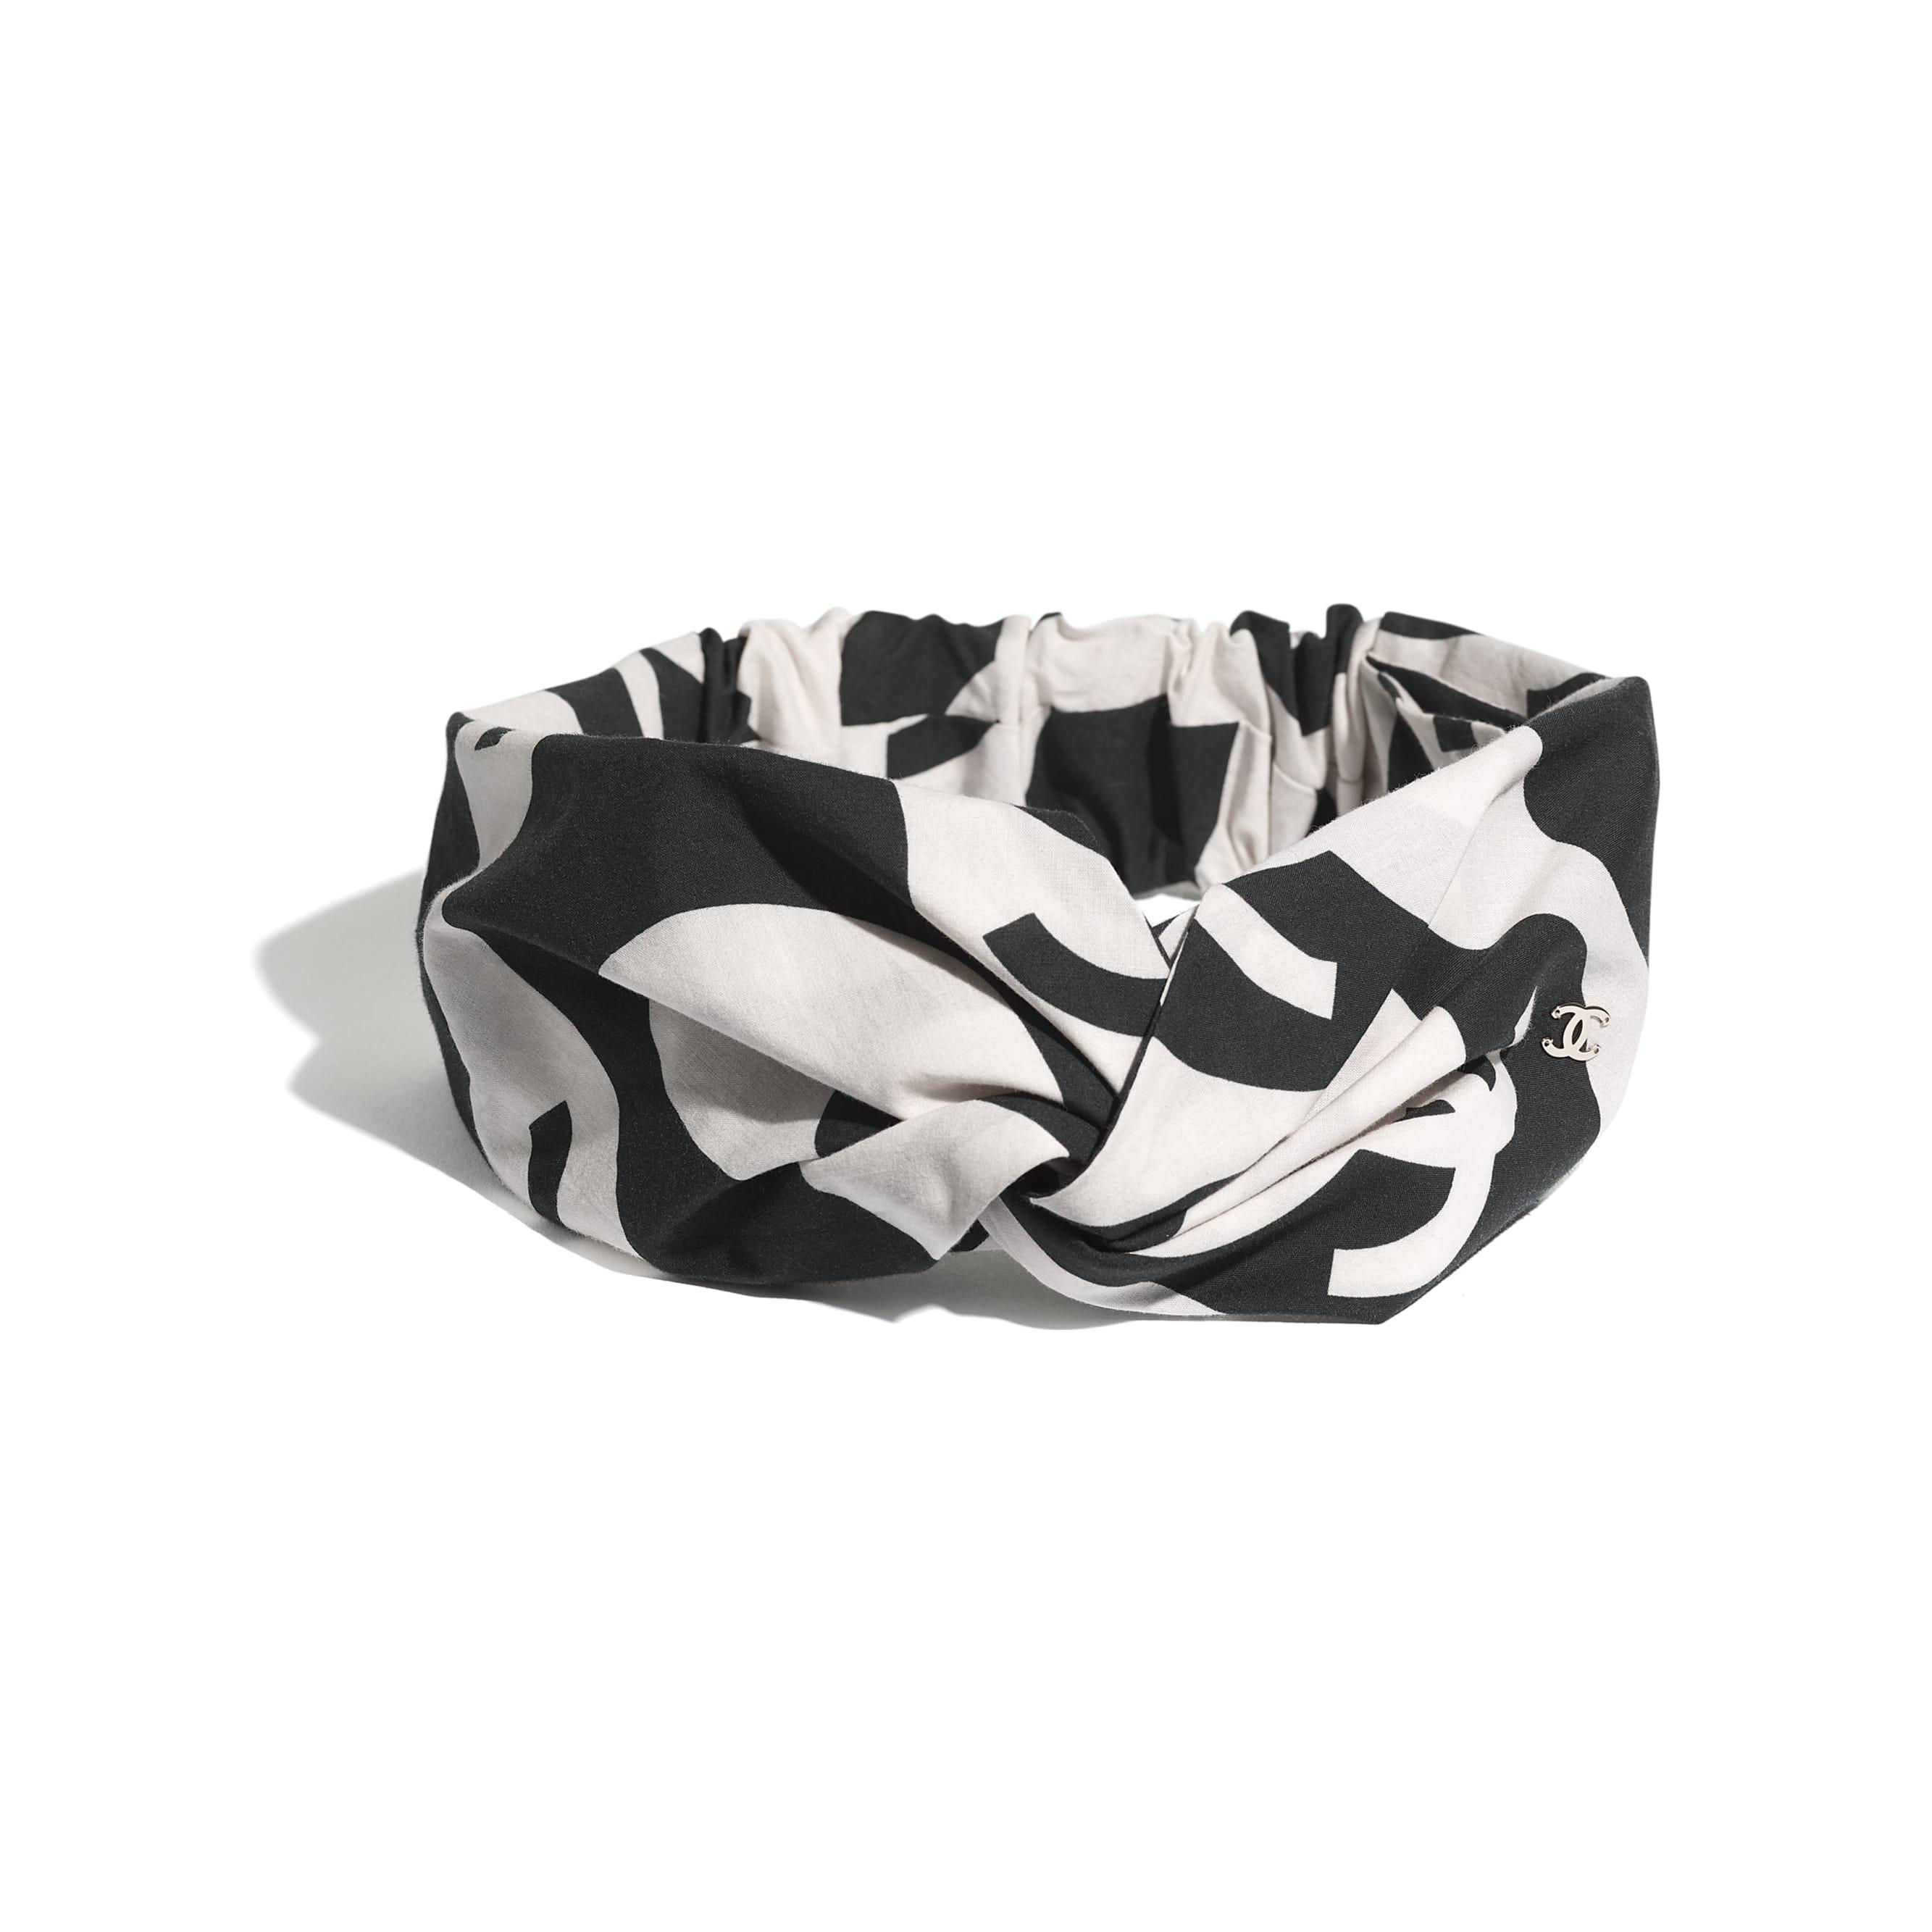 Headband - Black & Ecru - Cotton - CHANEL - Alternative view - see standard sized version